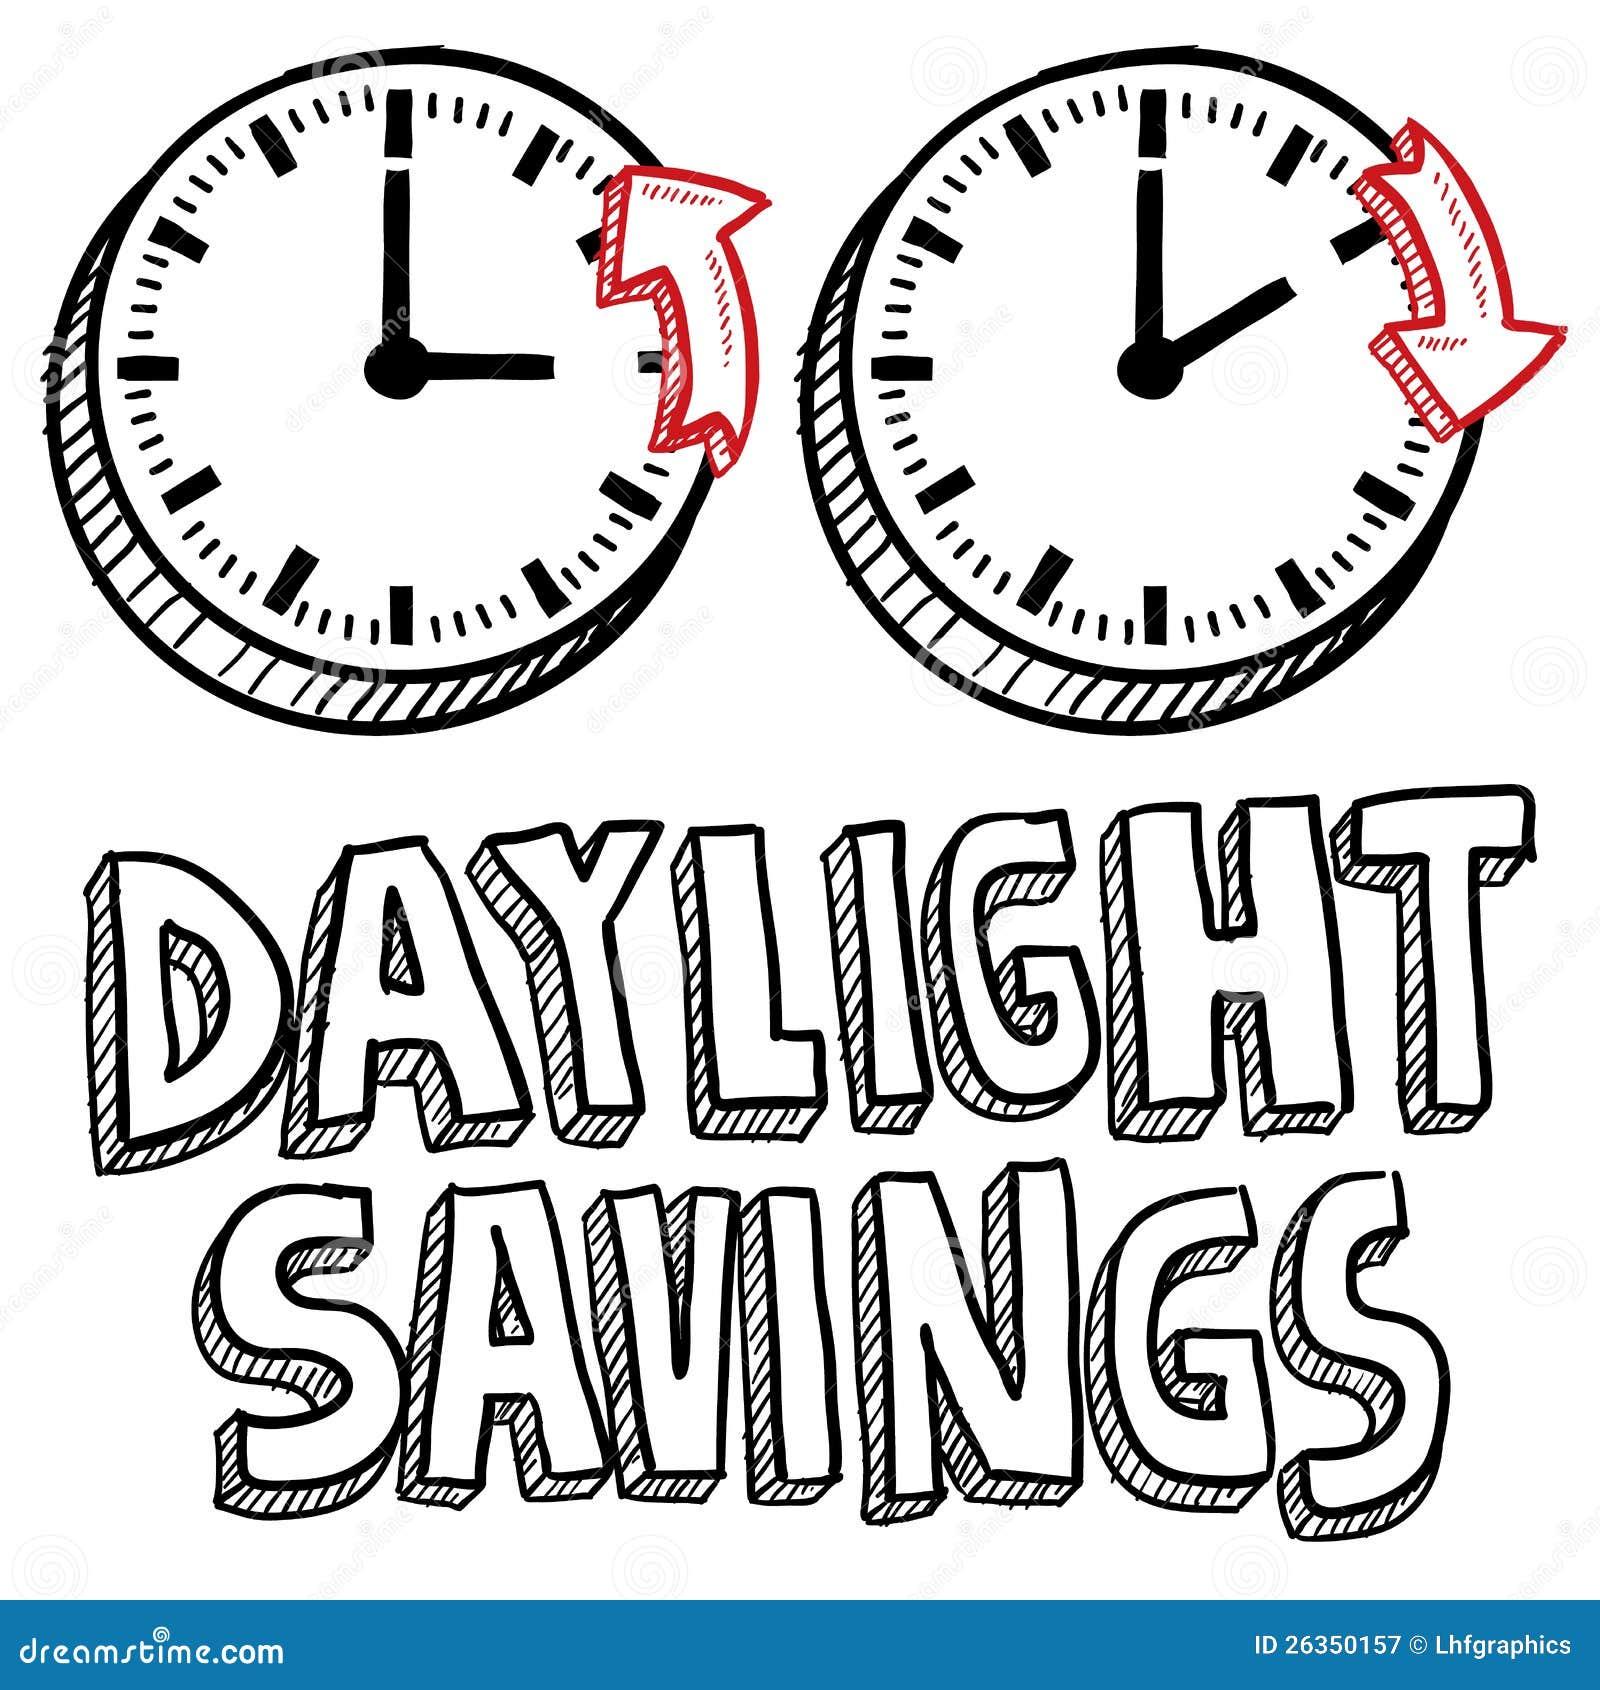 daylight savings time sketch stock vector